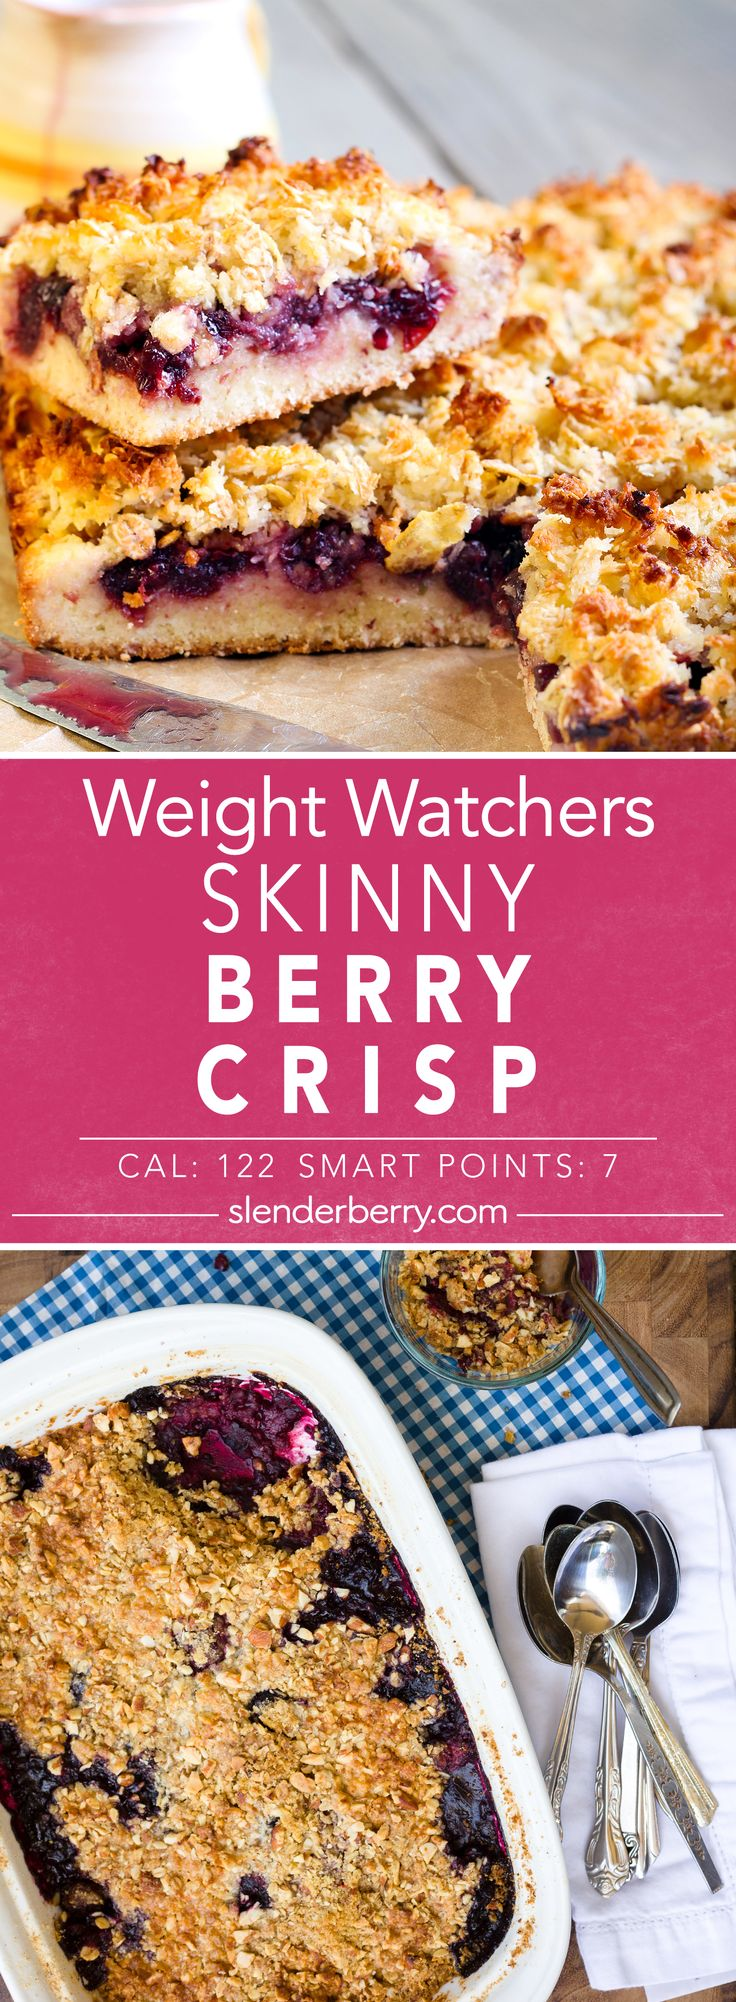 Weight Watchers Skinny Berry Crisp Recipe - 7 Smart Points 122 Calories